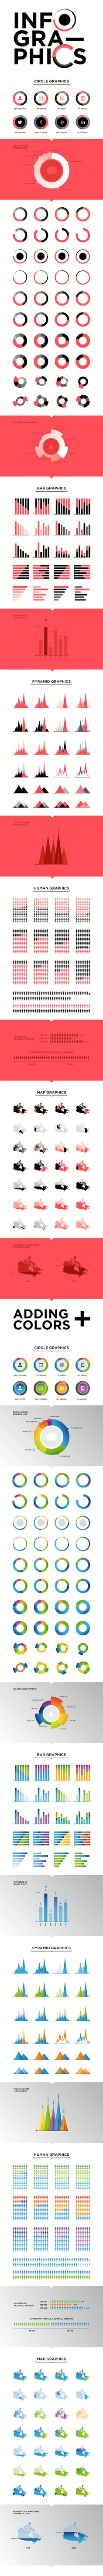 Infographics #infografia #infographic #design